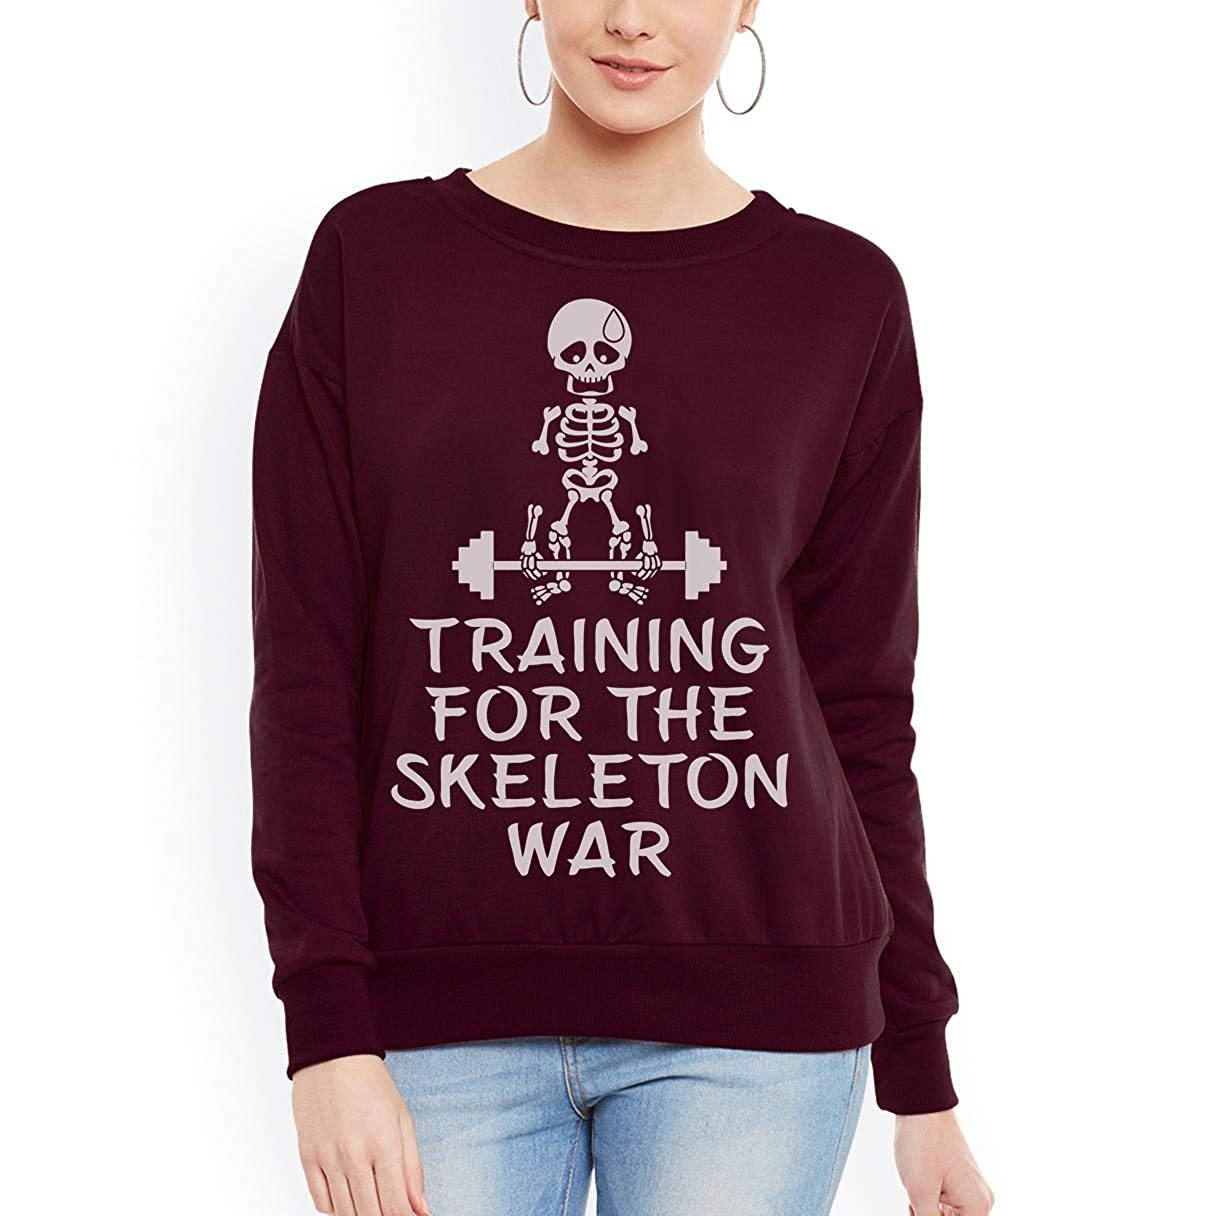 Training for The Skeleton War Unisex Sweatshirt tee